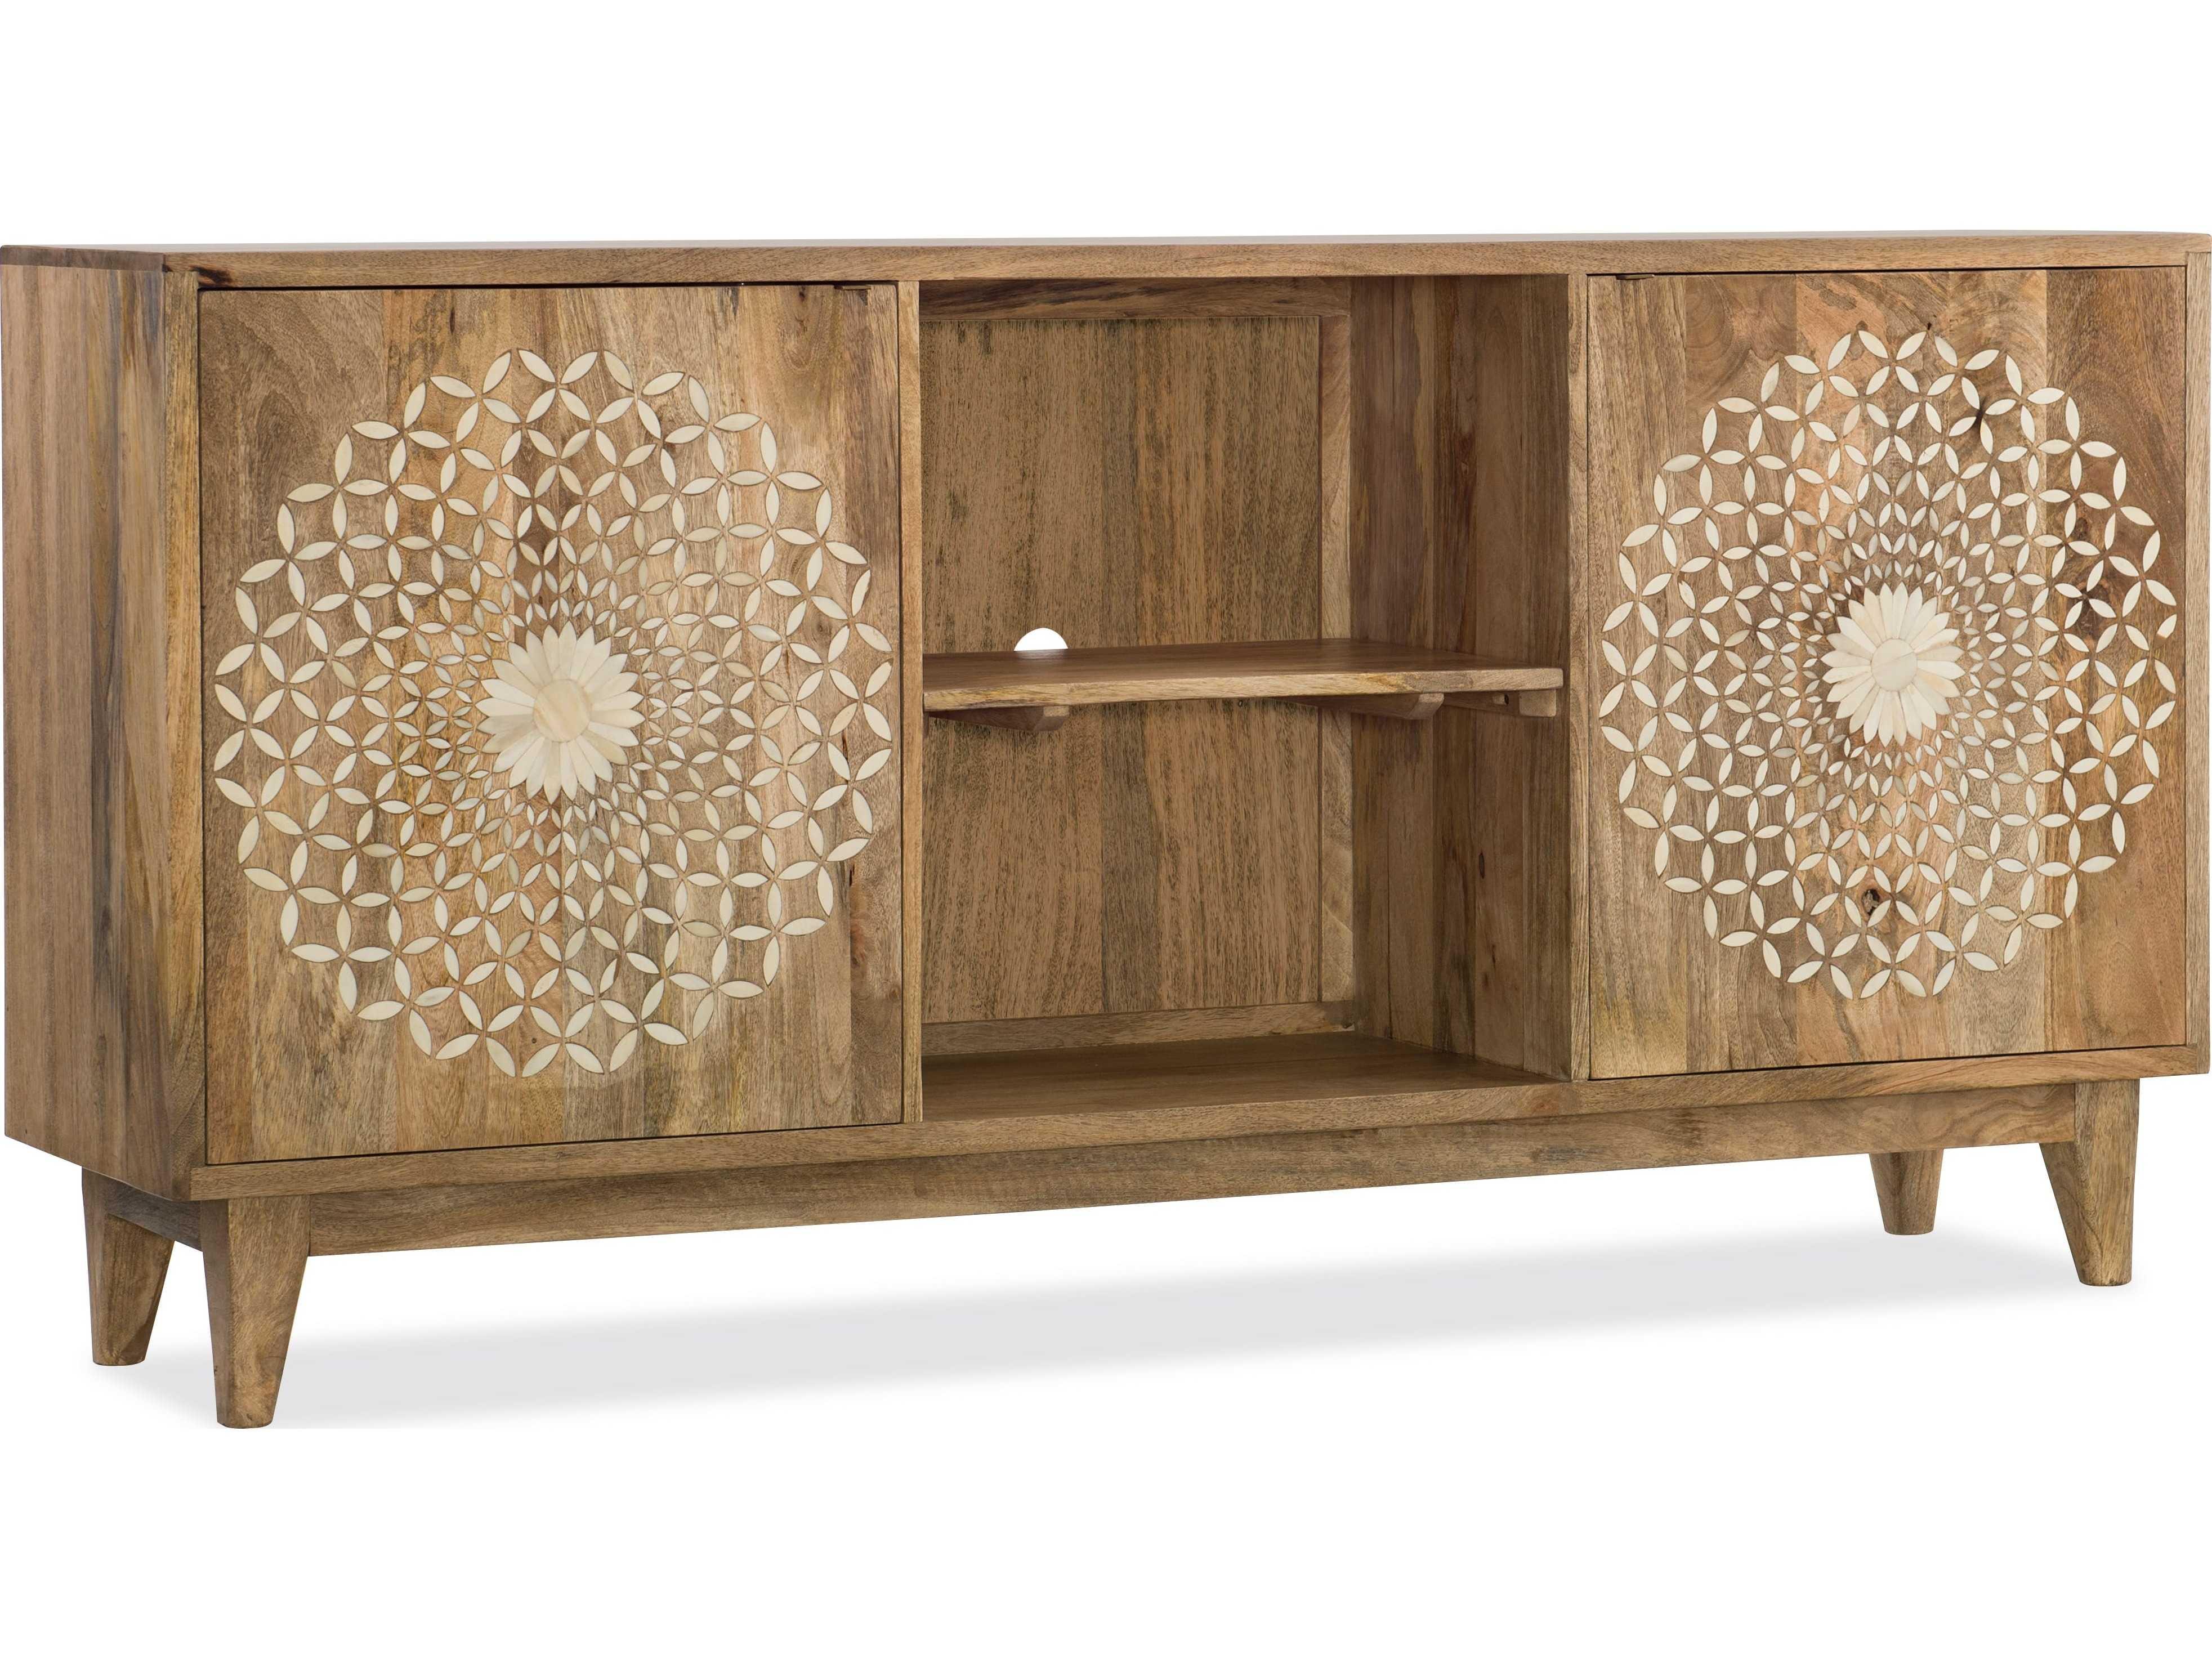 ... Hooker Furniture Point Reyes Light Wood With Bone Inlay 69u0027u0027L X 16u0027 ...